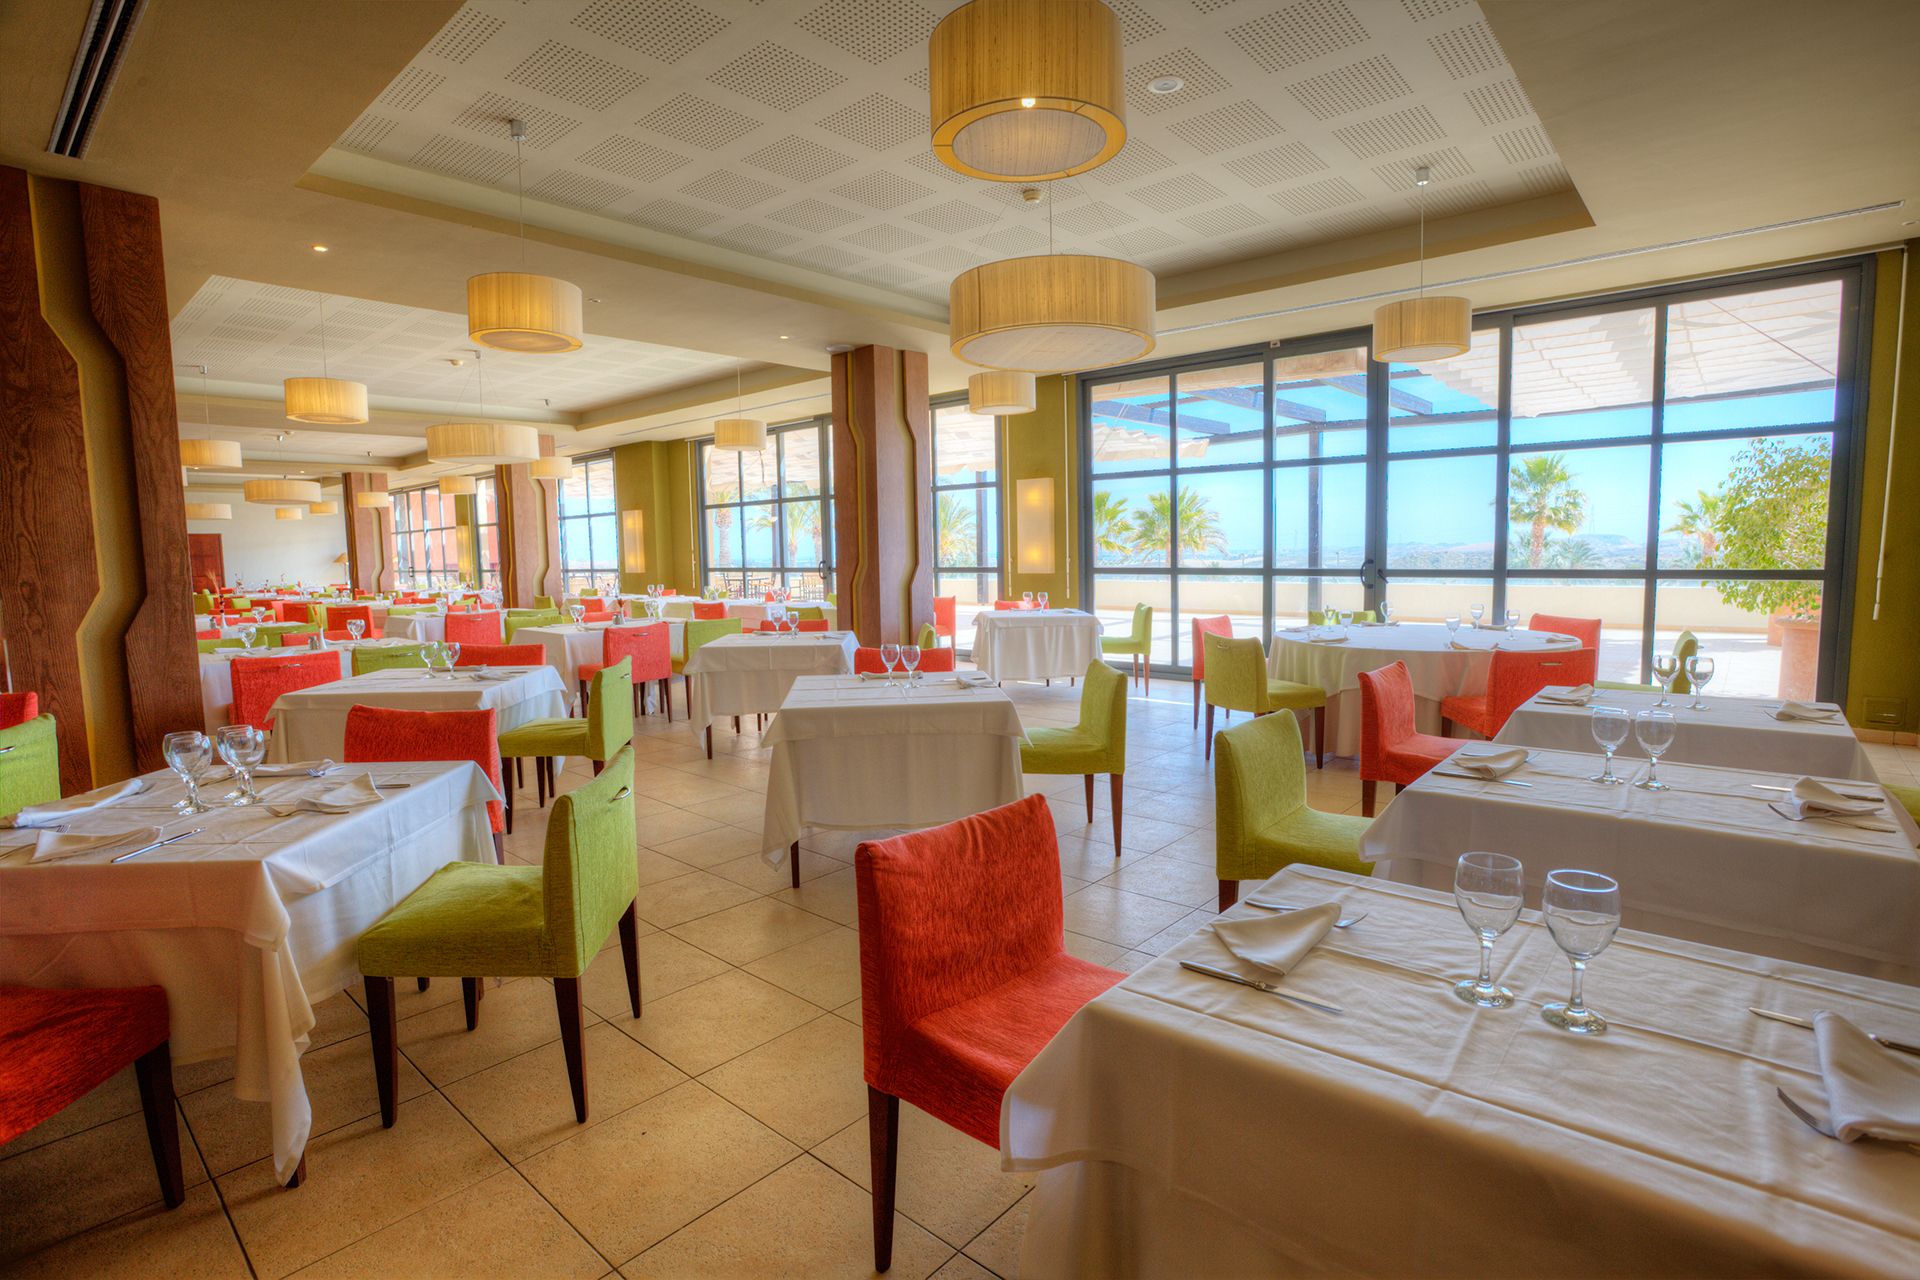 Golf-Expedition-Golf-reizen-Spanje-Regio-Valencia-Valle-Del-este-Golf-resort-restaurant-buffet